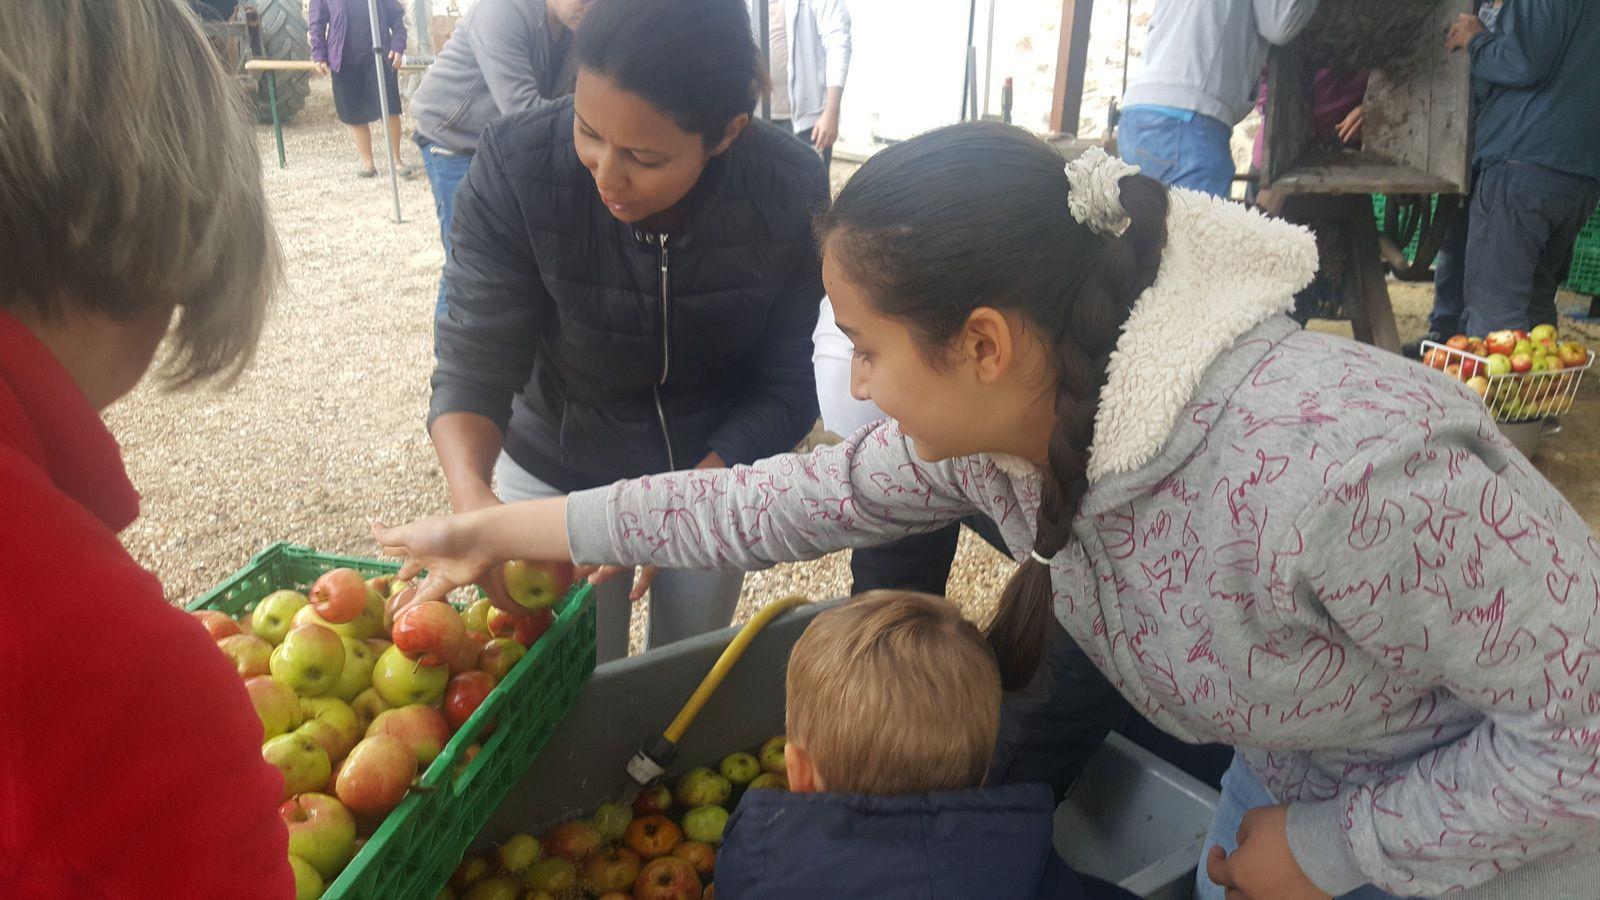 fête de la pomme a janvry